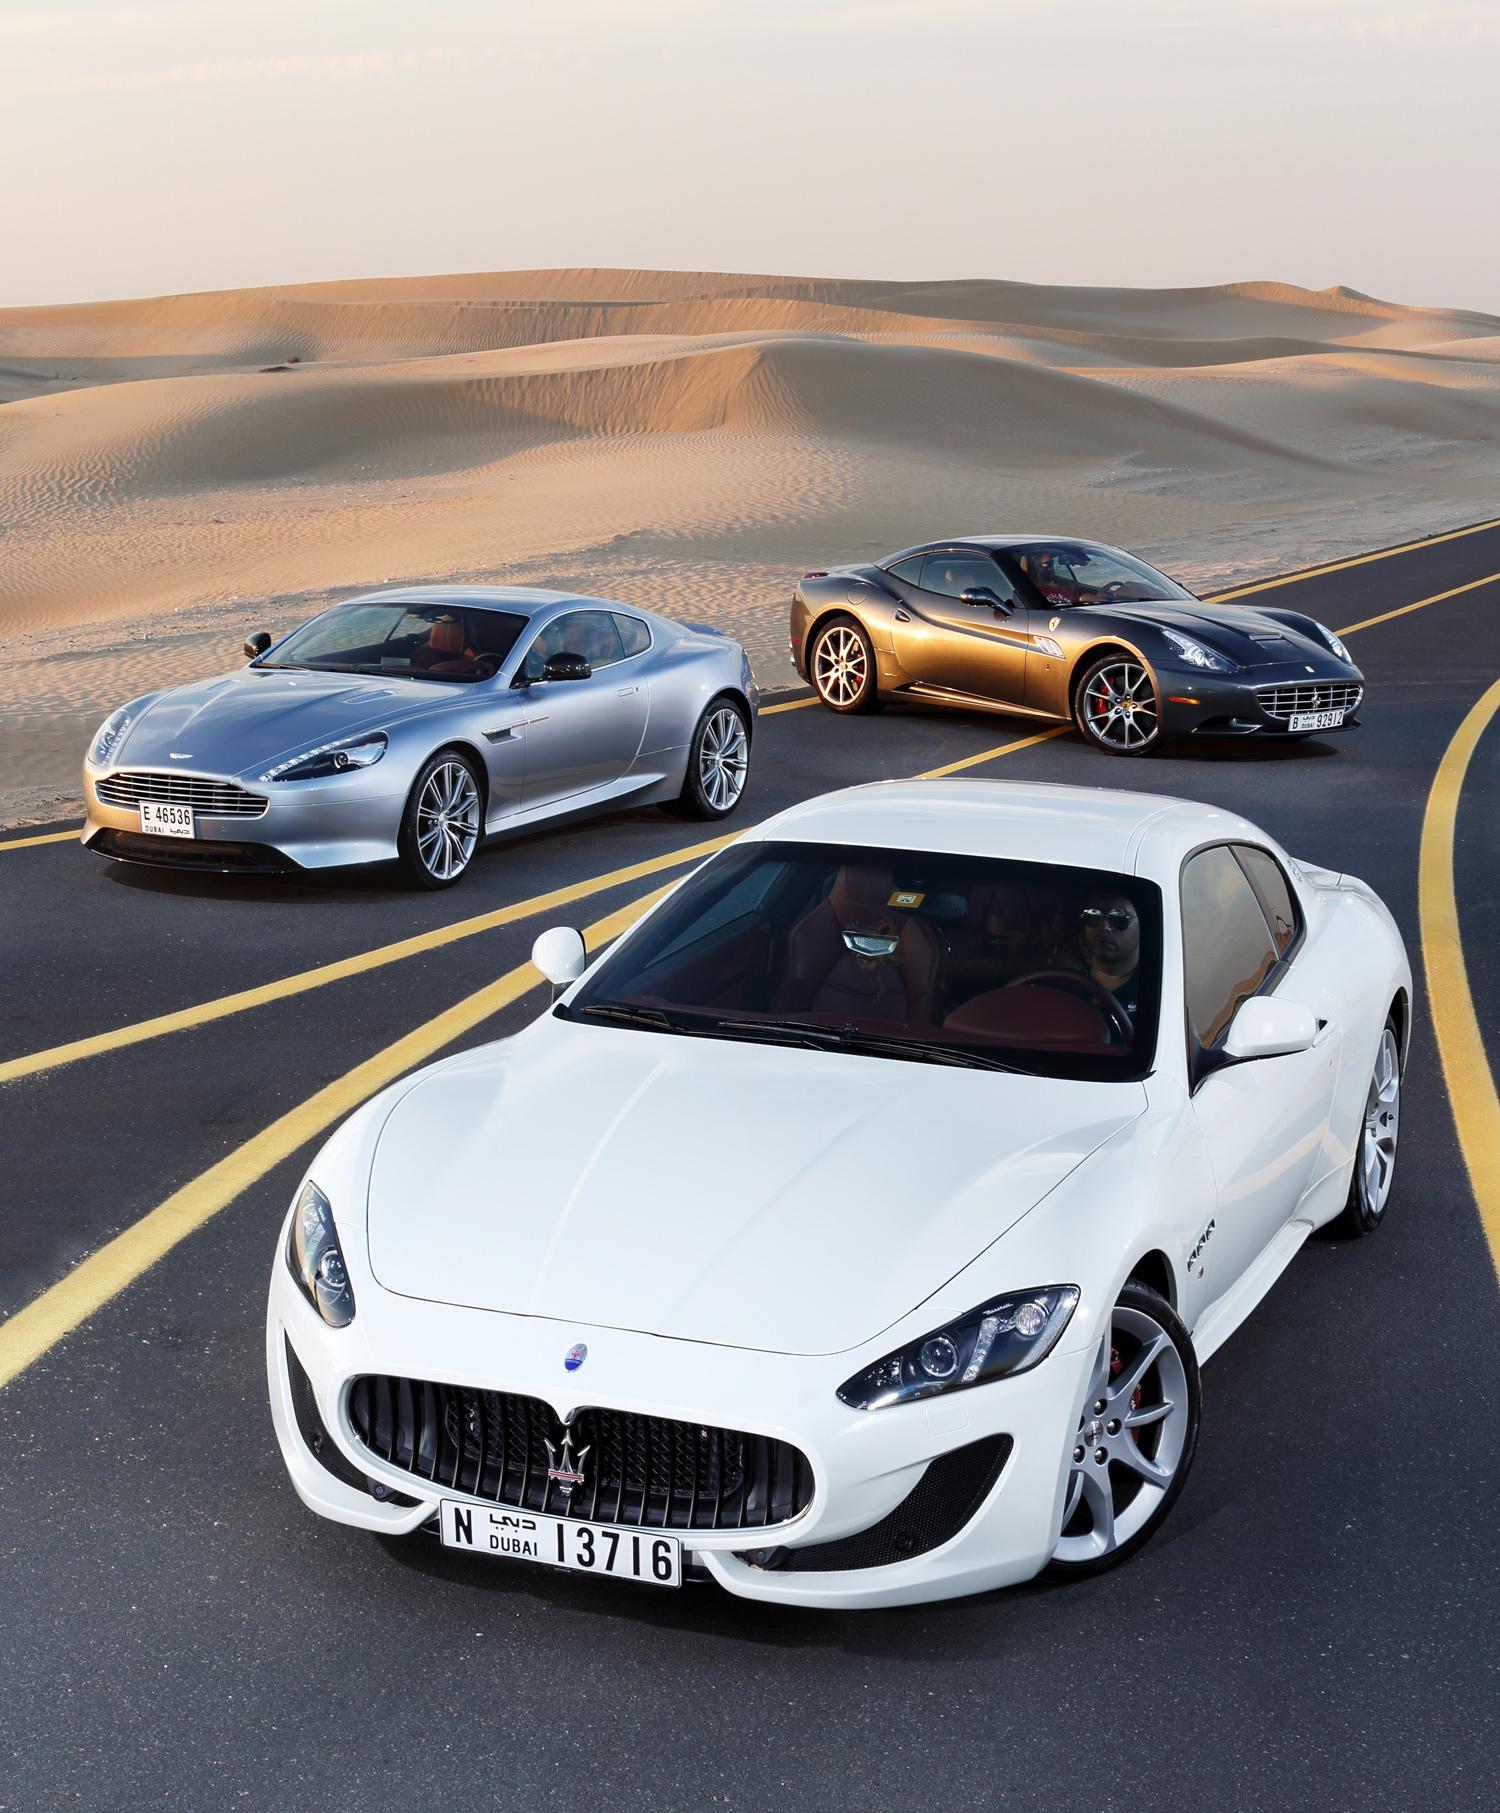 WH_130120_Maserati-Bentley-Aston_STF_Stefan23.jpg